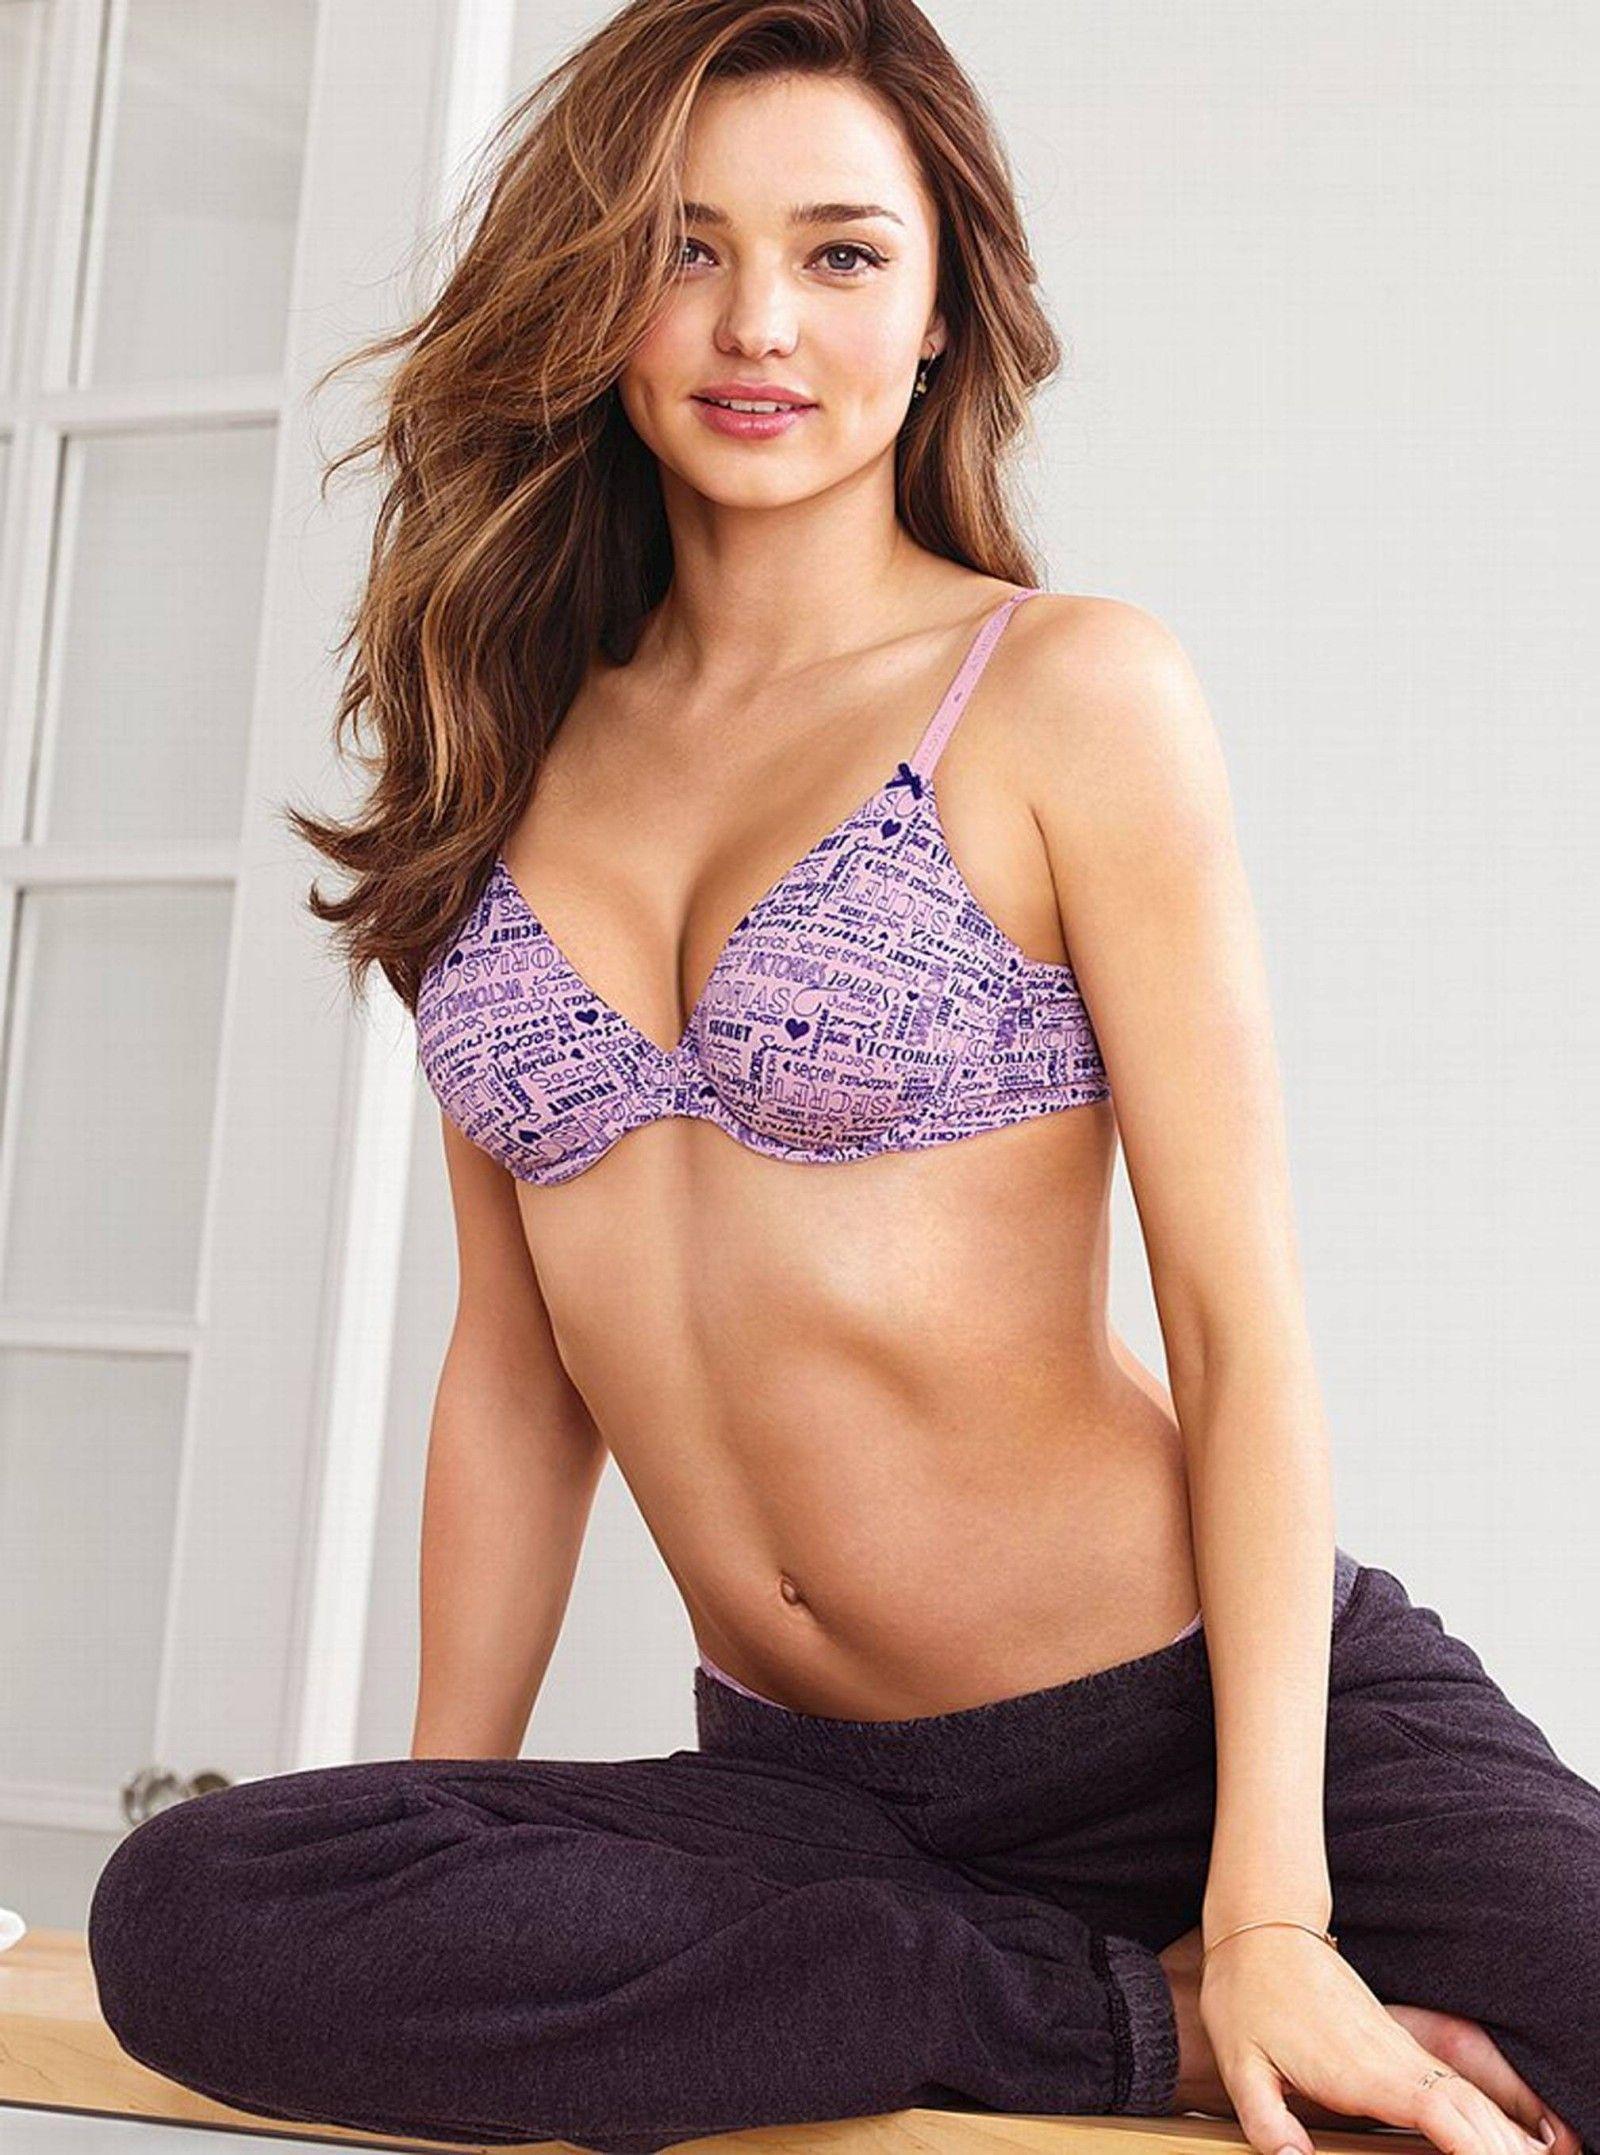 Miranda Kerr - Victoria's Secret Lingerie Photoshoot | Hottie ...